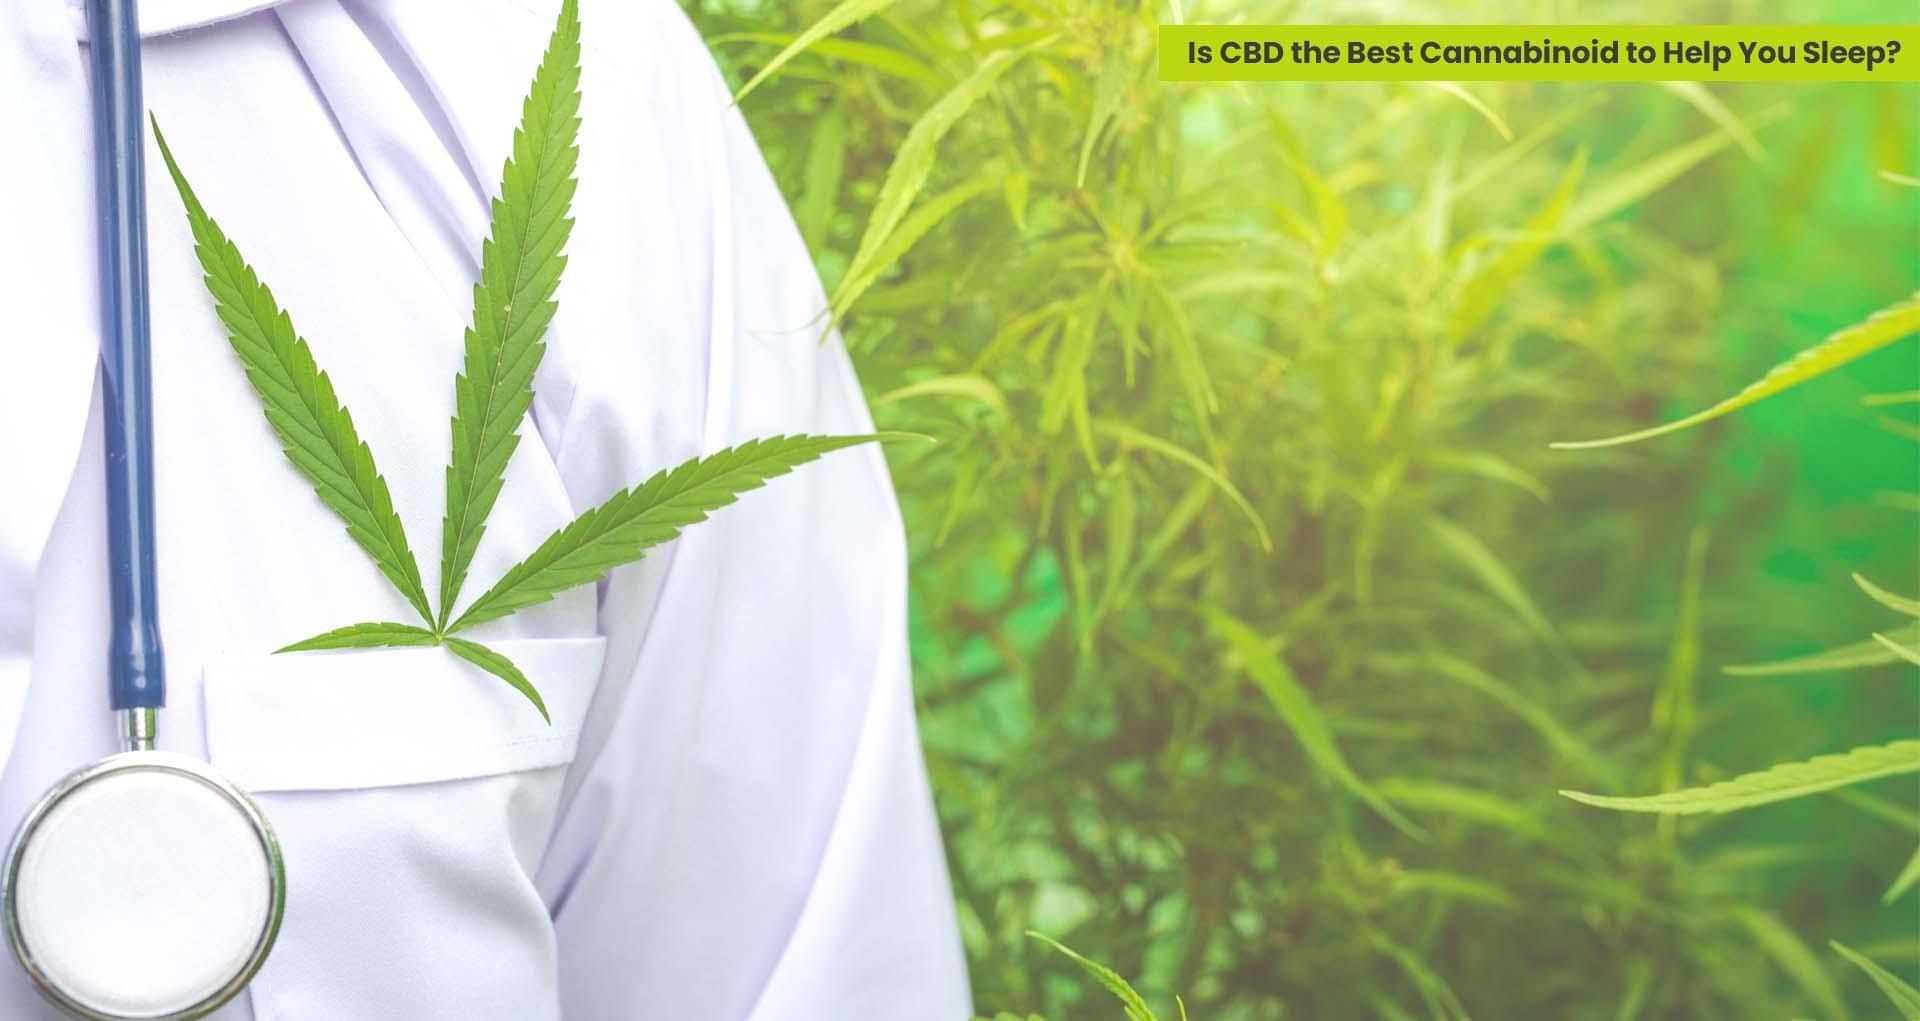 Is CBD the Best Cannabinoid to Help You Sleep?